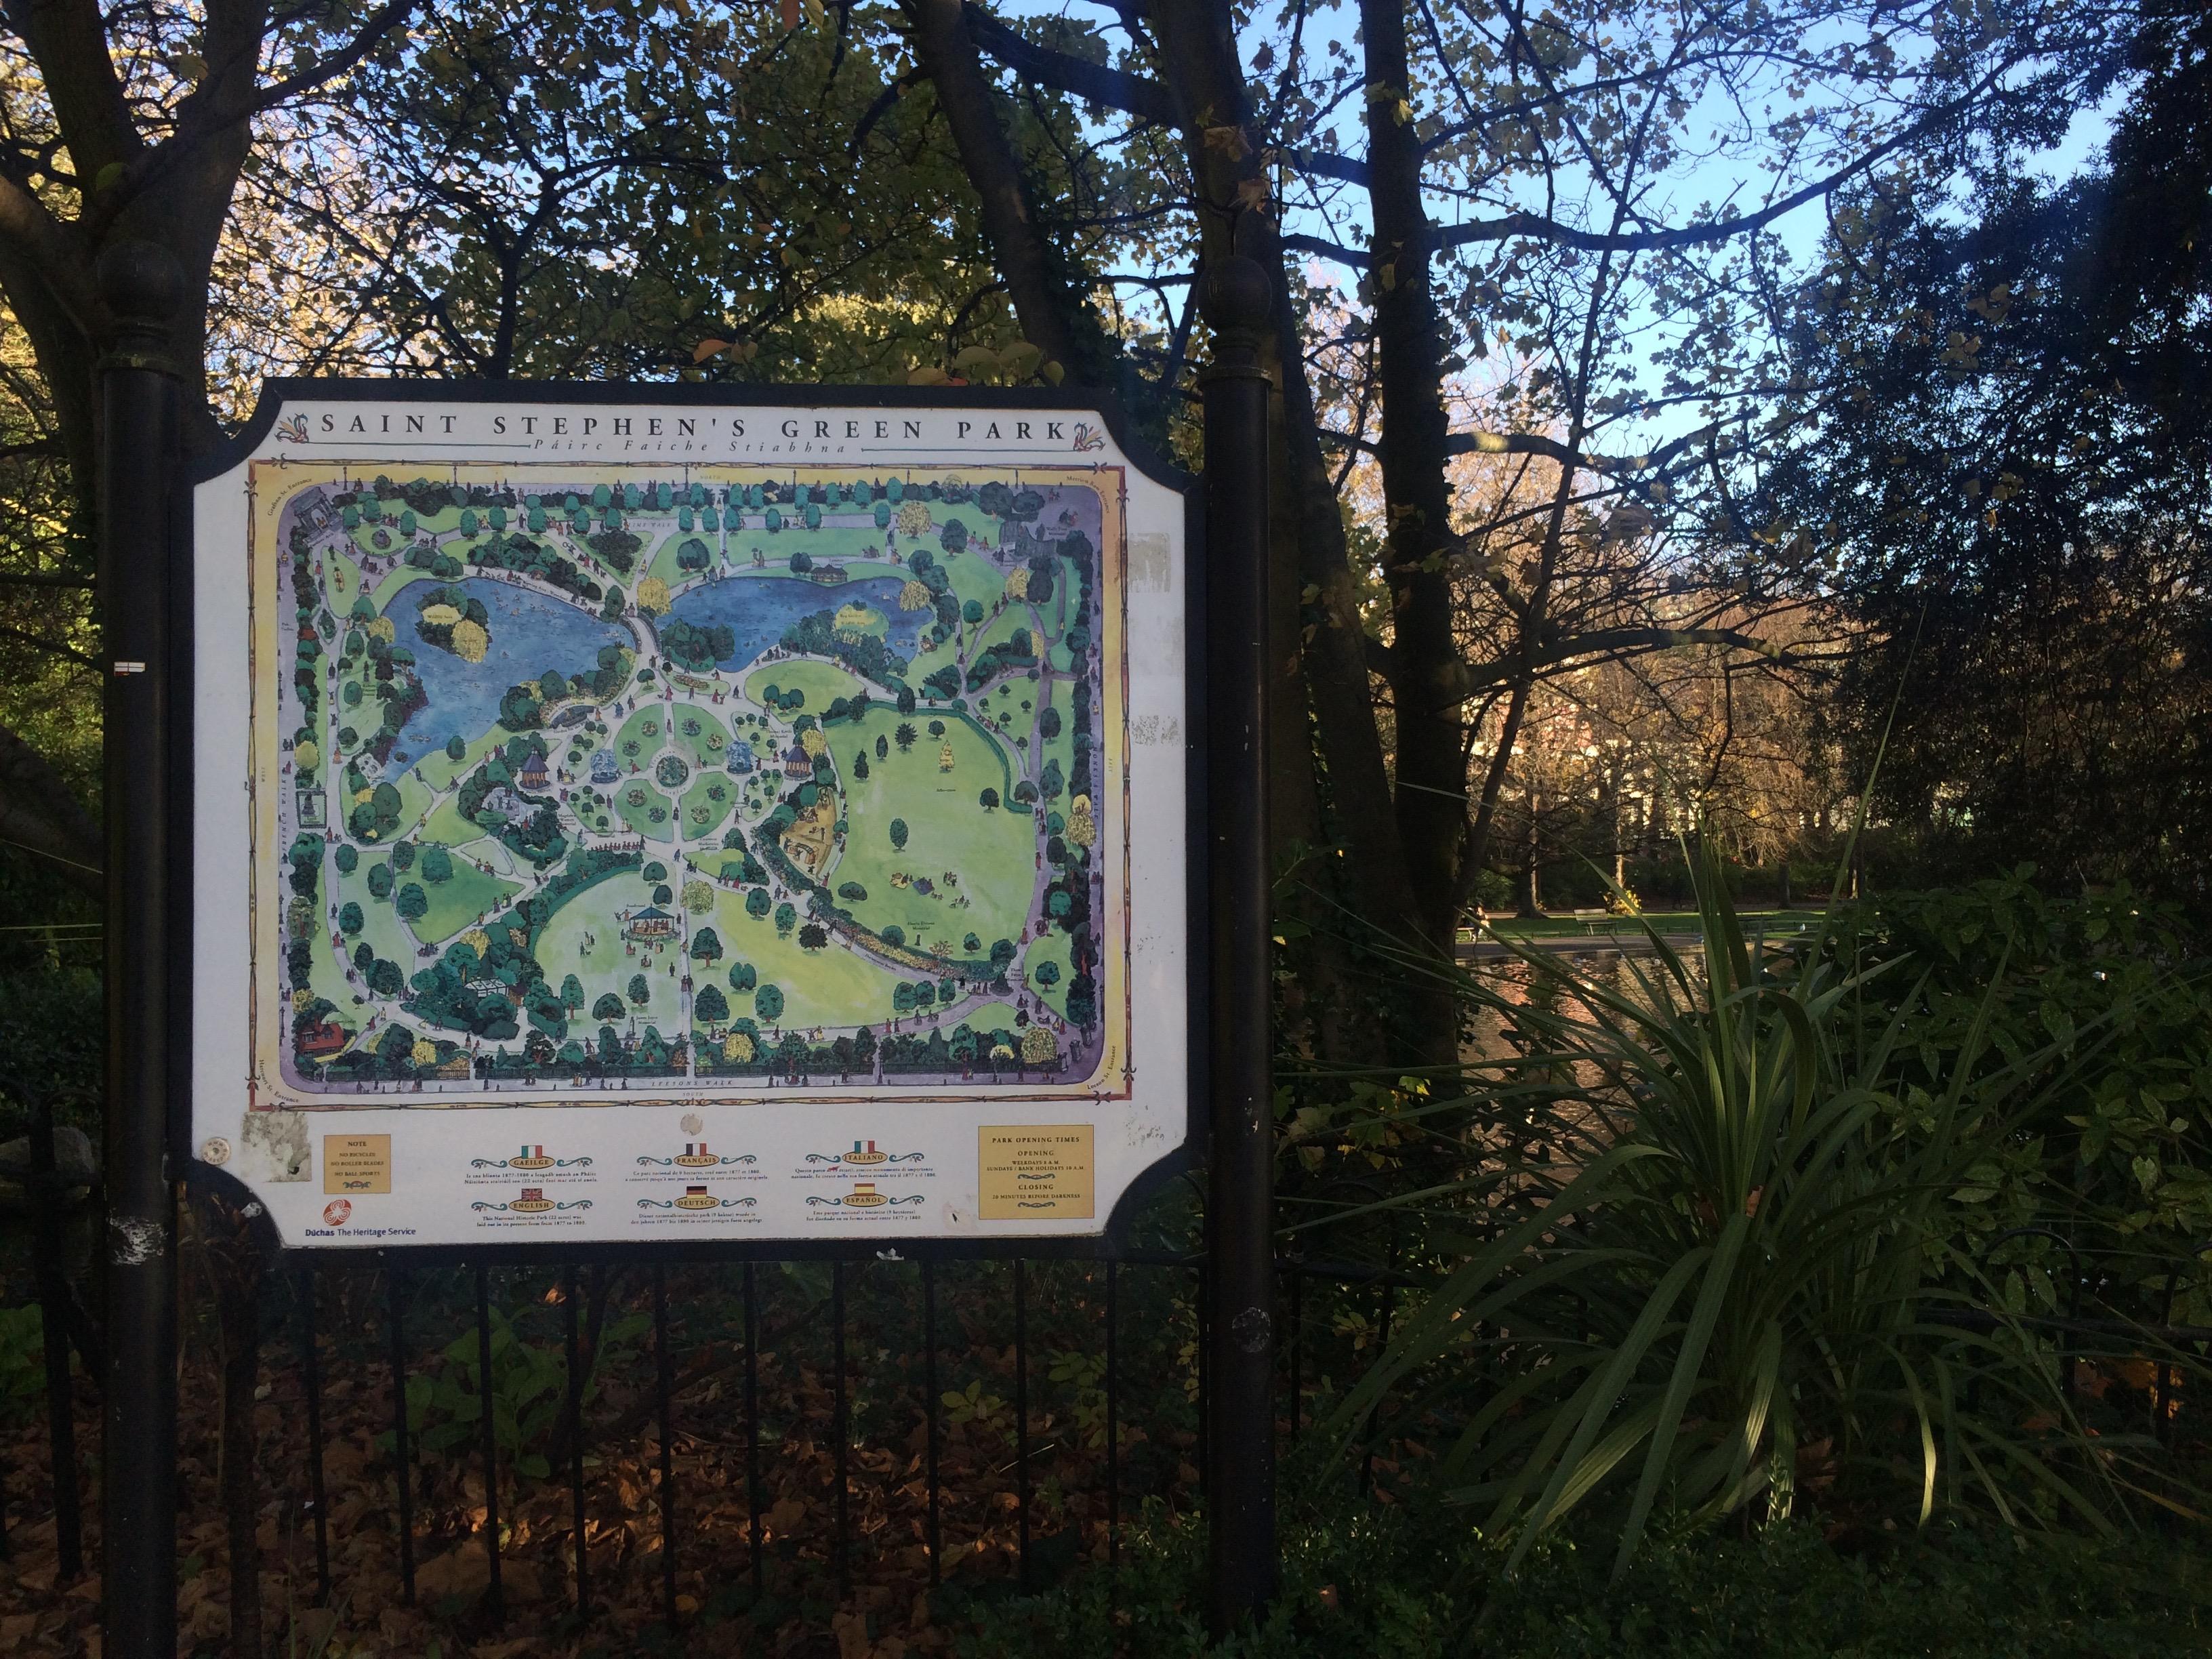 Saint Stephen's Green Park in Dublin, Ireland.